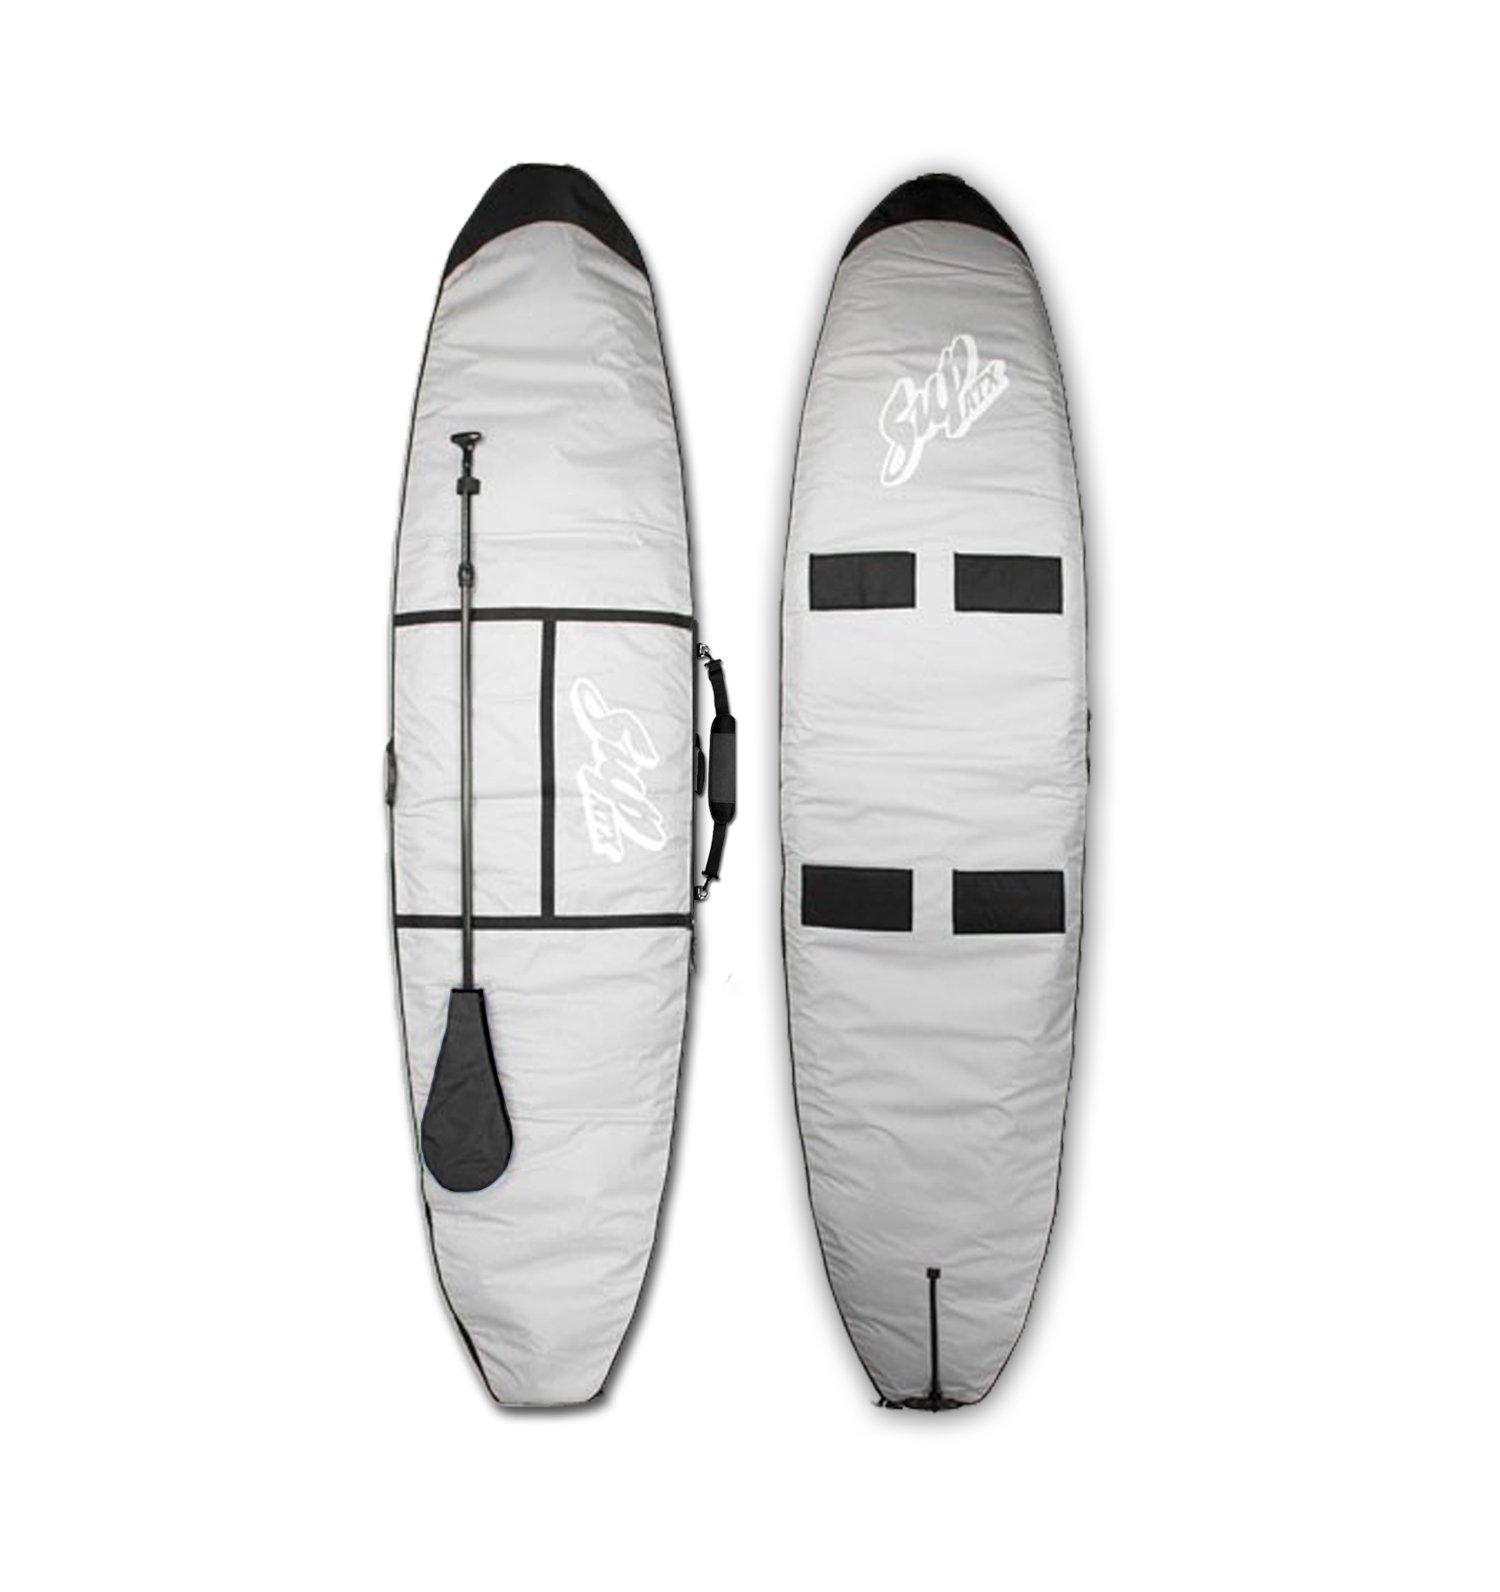 SUPATX Deluxe Paddleboard Bag, Grey, 10'0'' by Sup ATX (Image #1)